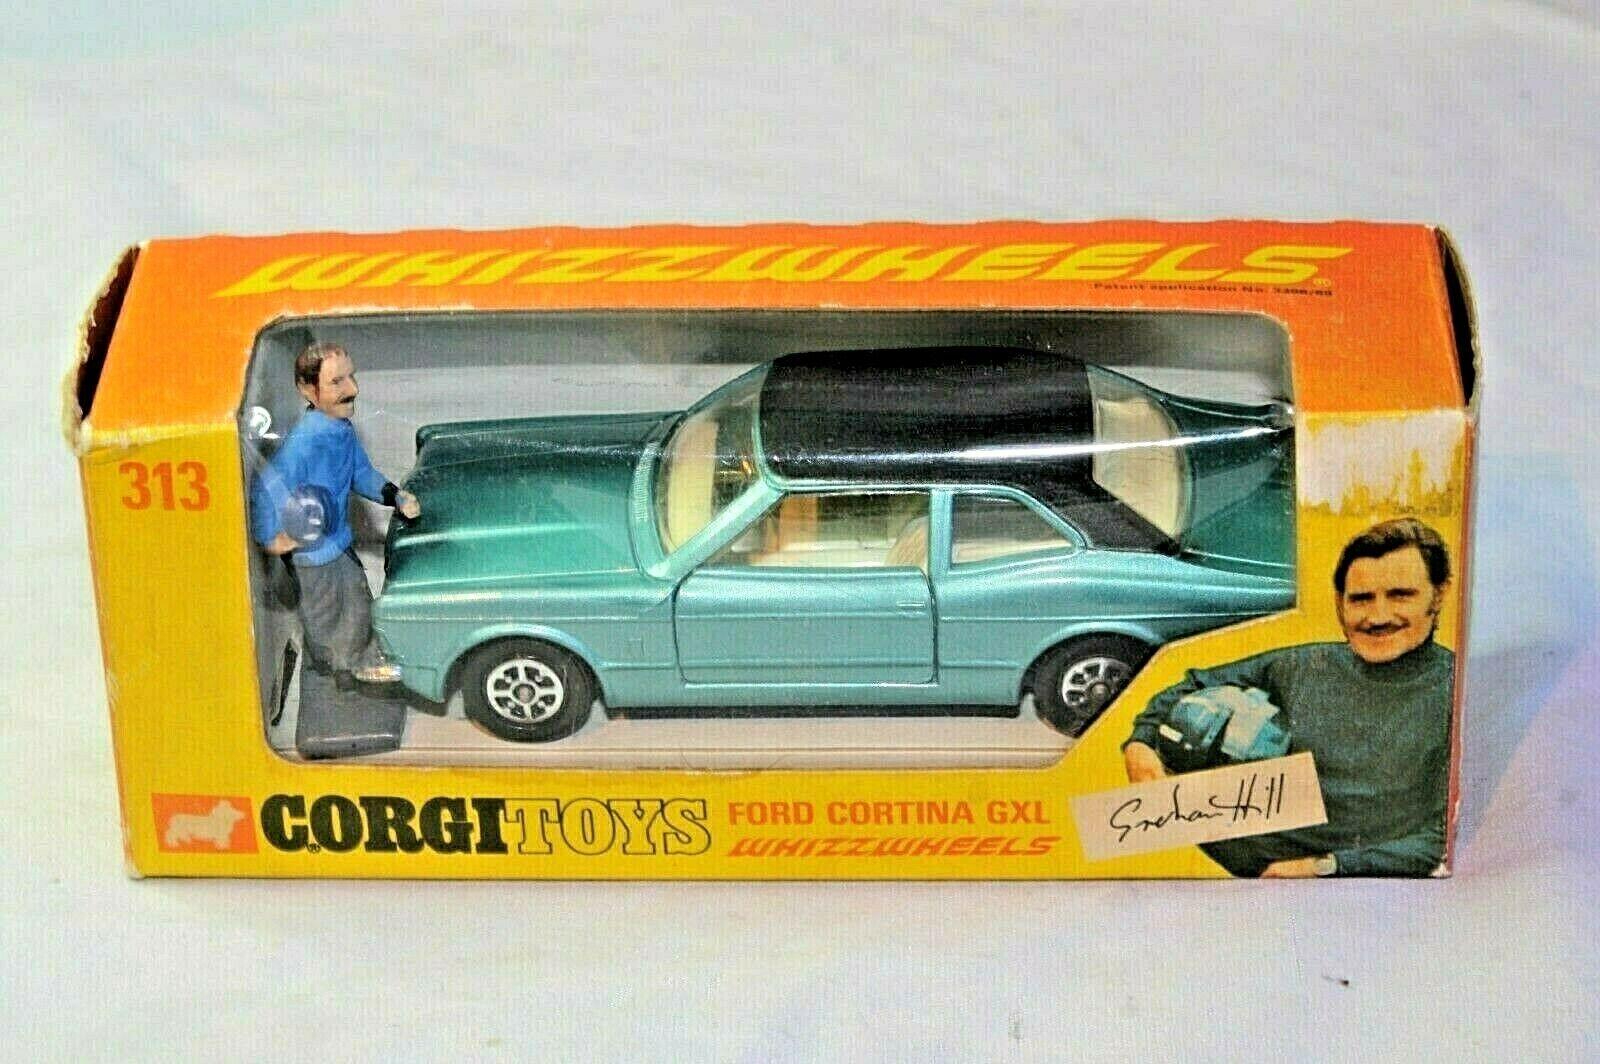 CORGI  313 Ford Cortina GXL, menthe avec figurine dans boîte d'origine, Imprimer Erreur sur boîte